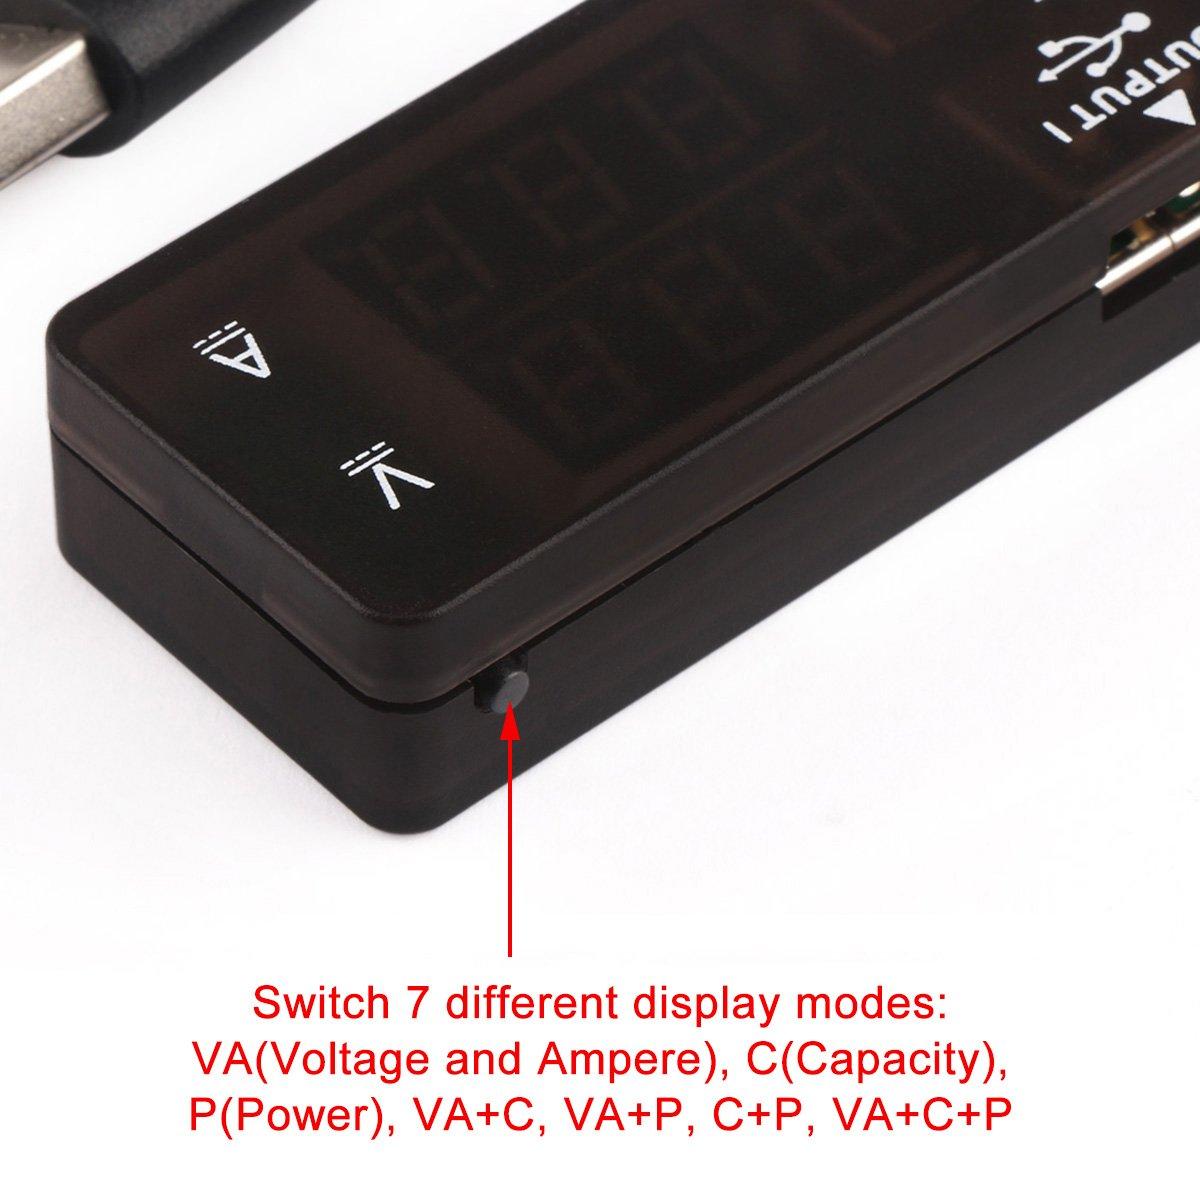 Drok Usb 20 Digital Multimeter Ammeter Voltmeter Capacitance And Led 5012 Psu Batt Chargers Electronic Components Watt Meter 7 Modes Multi Tester Tools Home Improvement